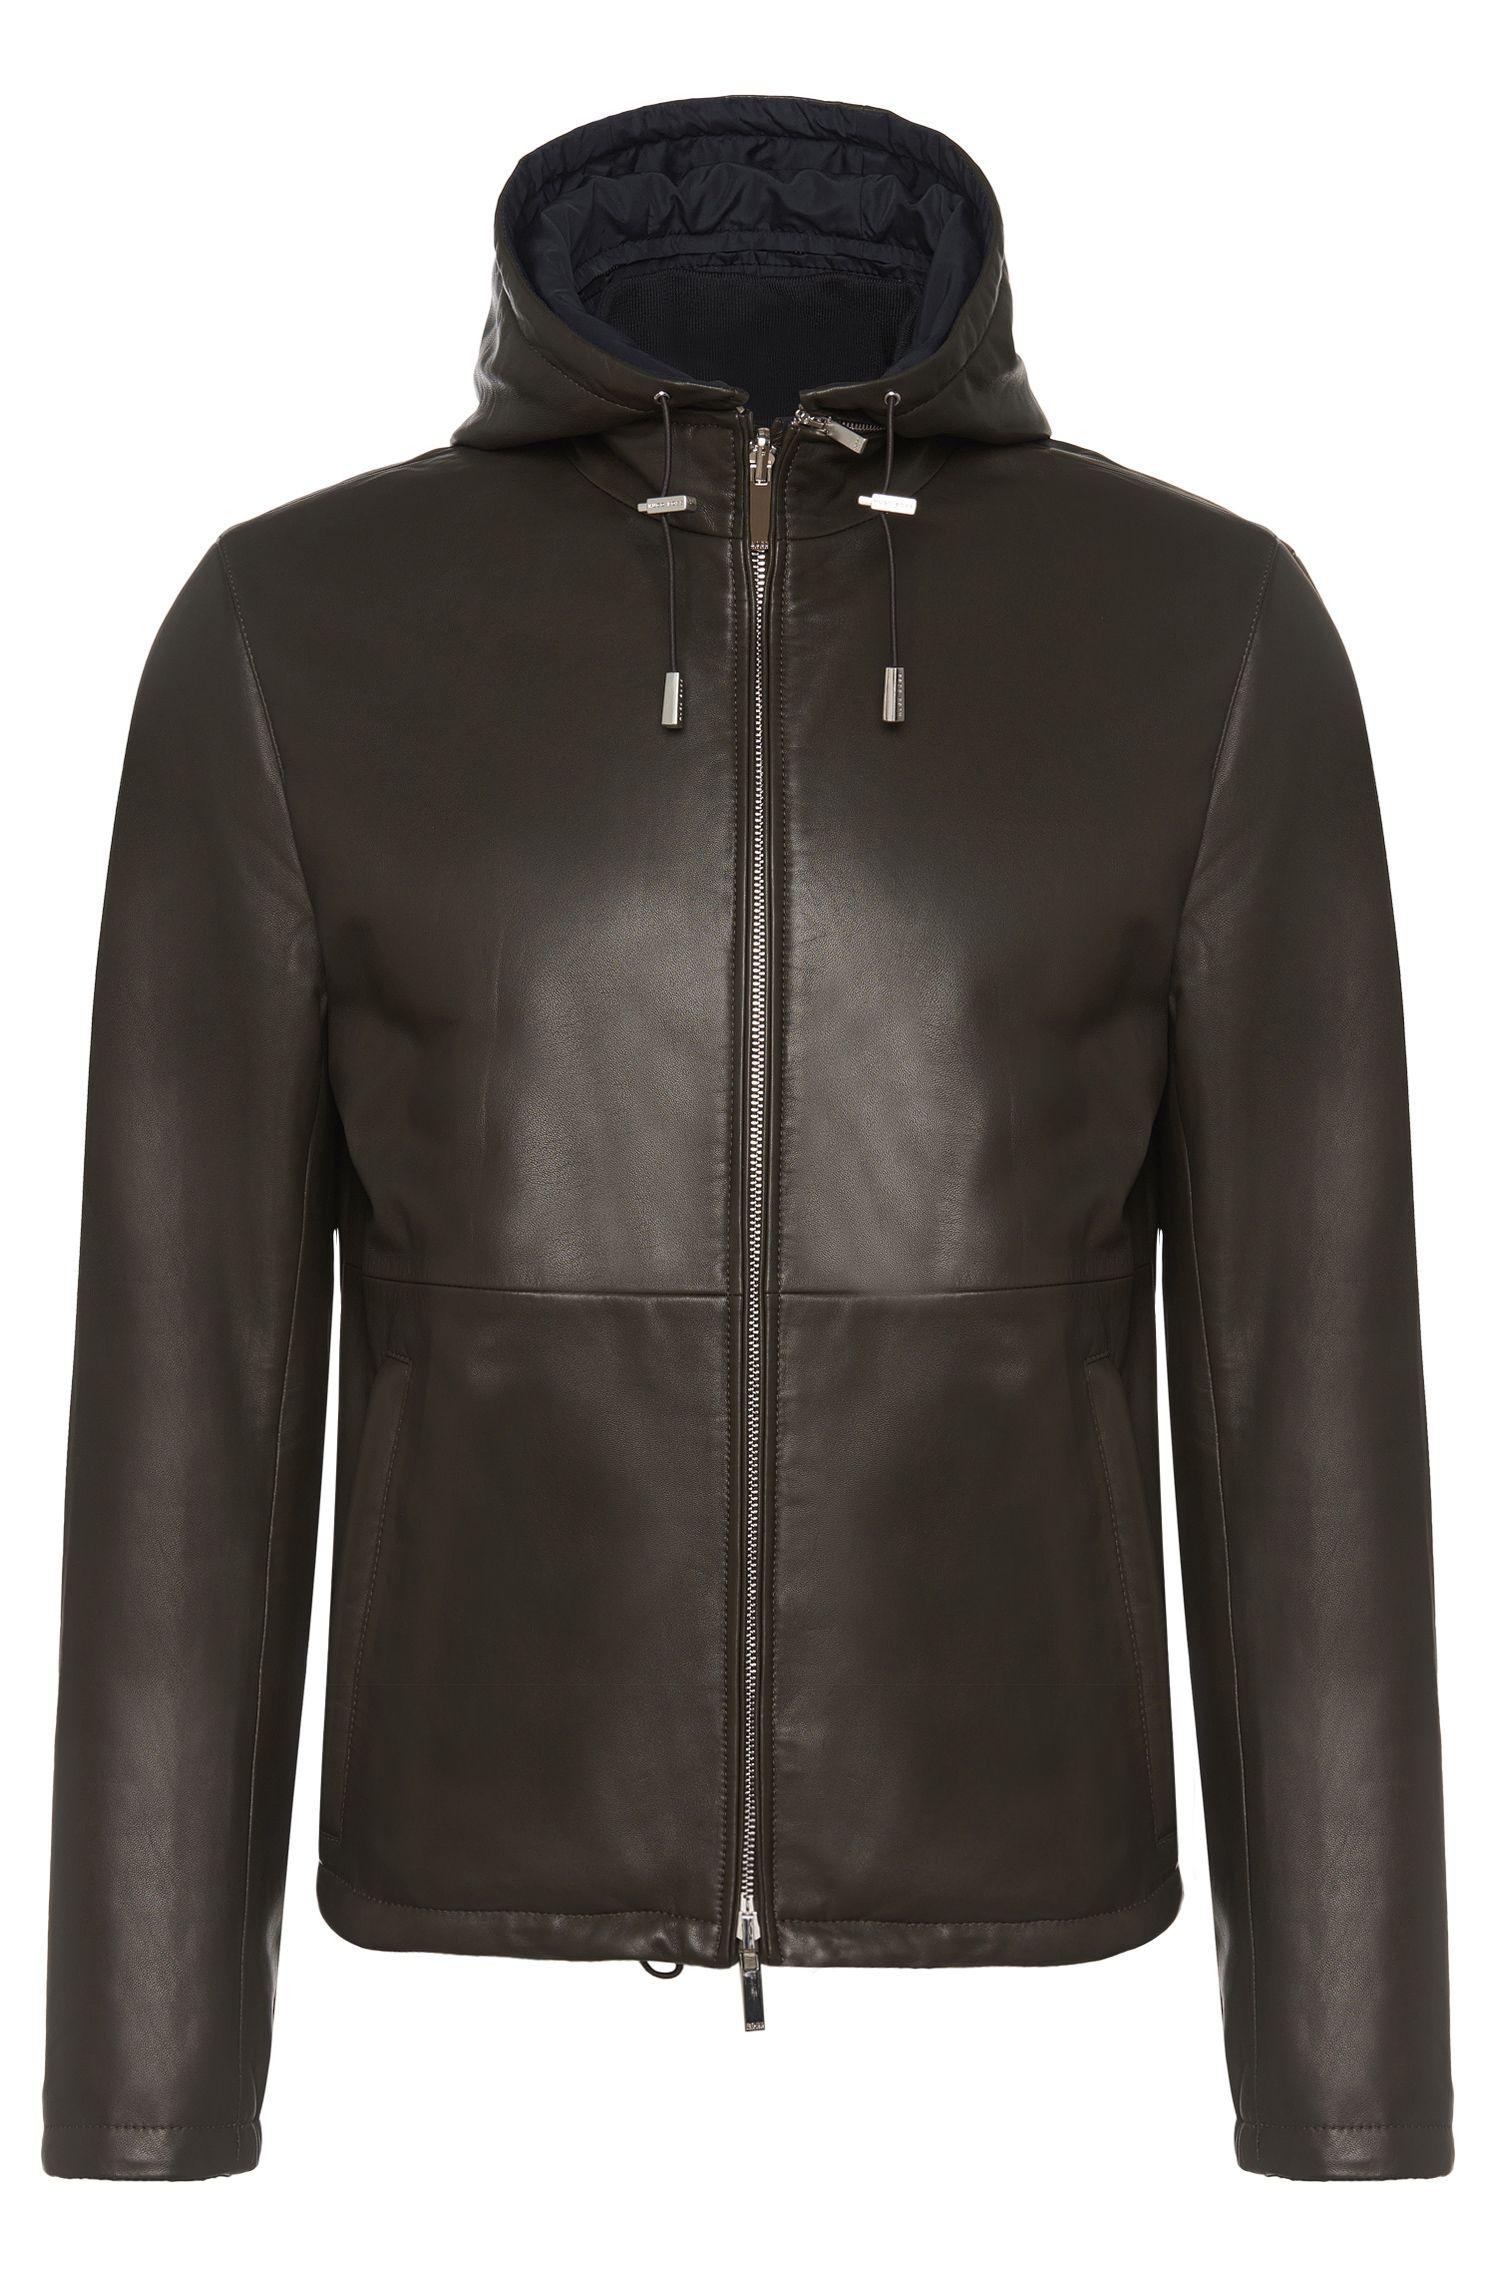 Lambskin Reversible Jacket | Driffis